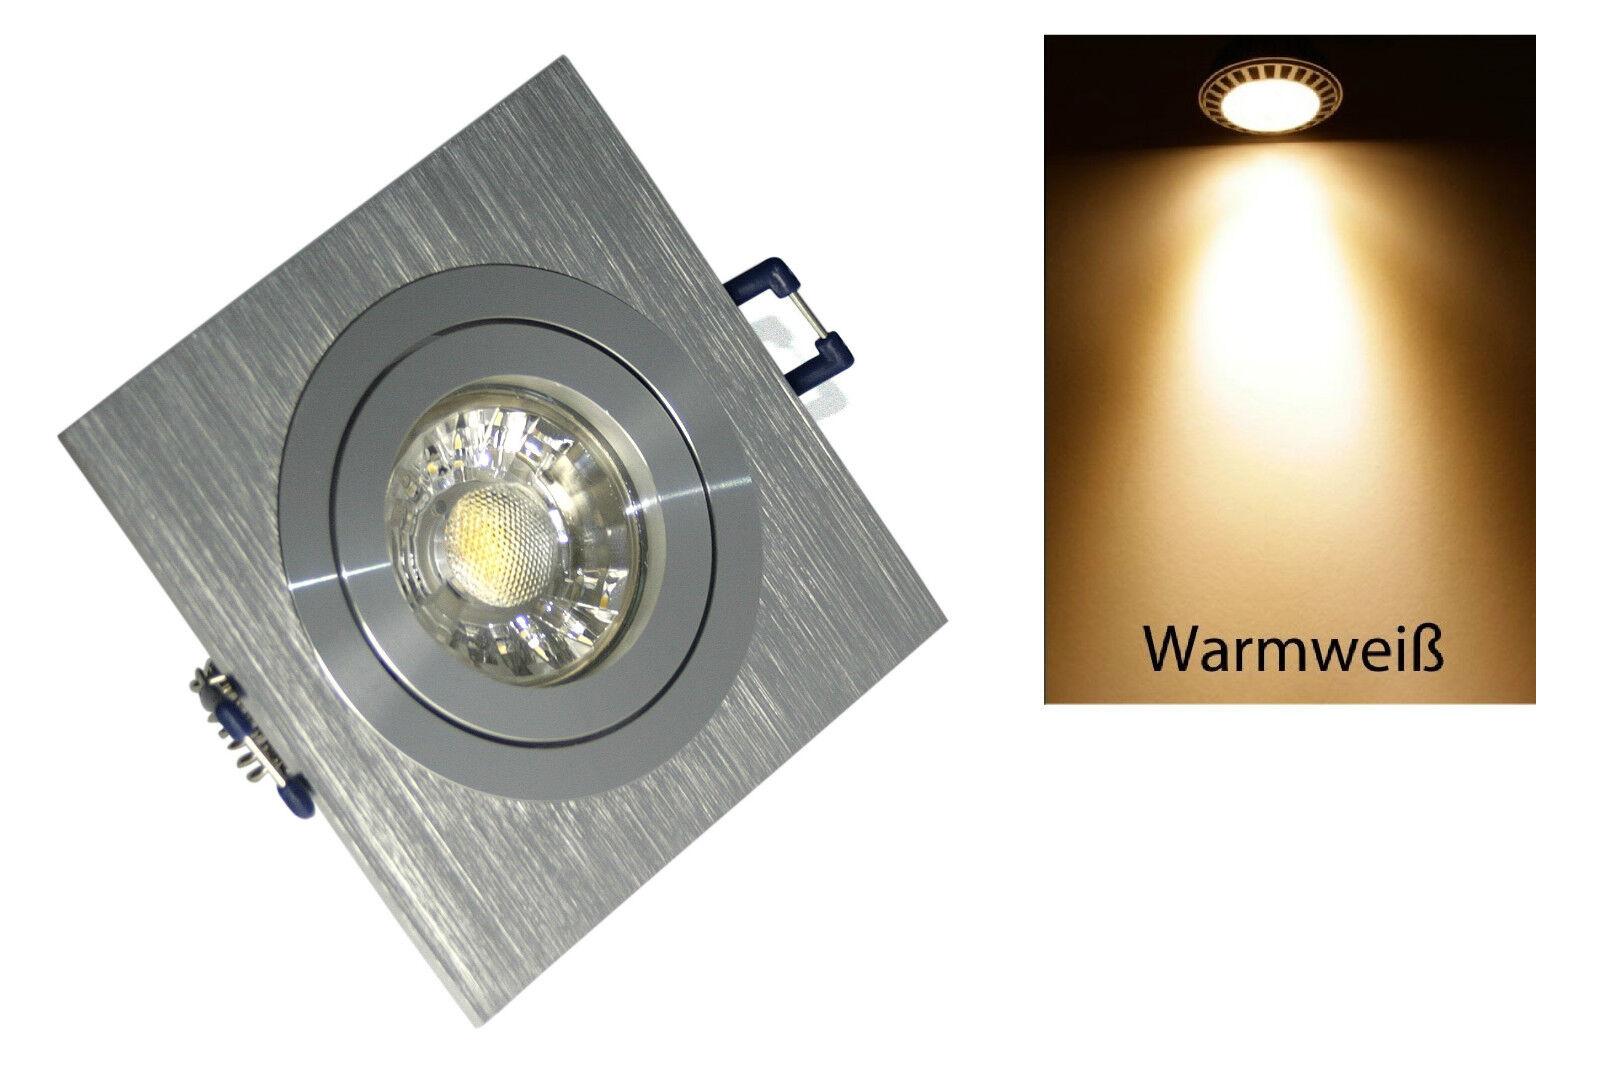 Mantas spot emisor lenard plata 230v gu10 gu10 gu10 cob 7w = 52w High Power LED regulable 7bc5d4